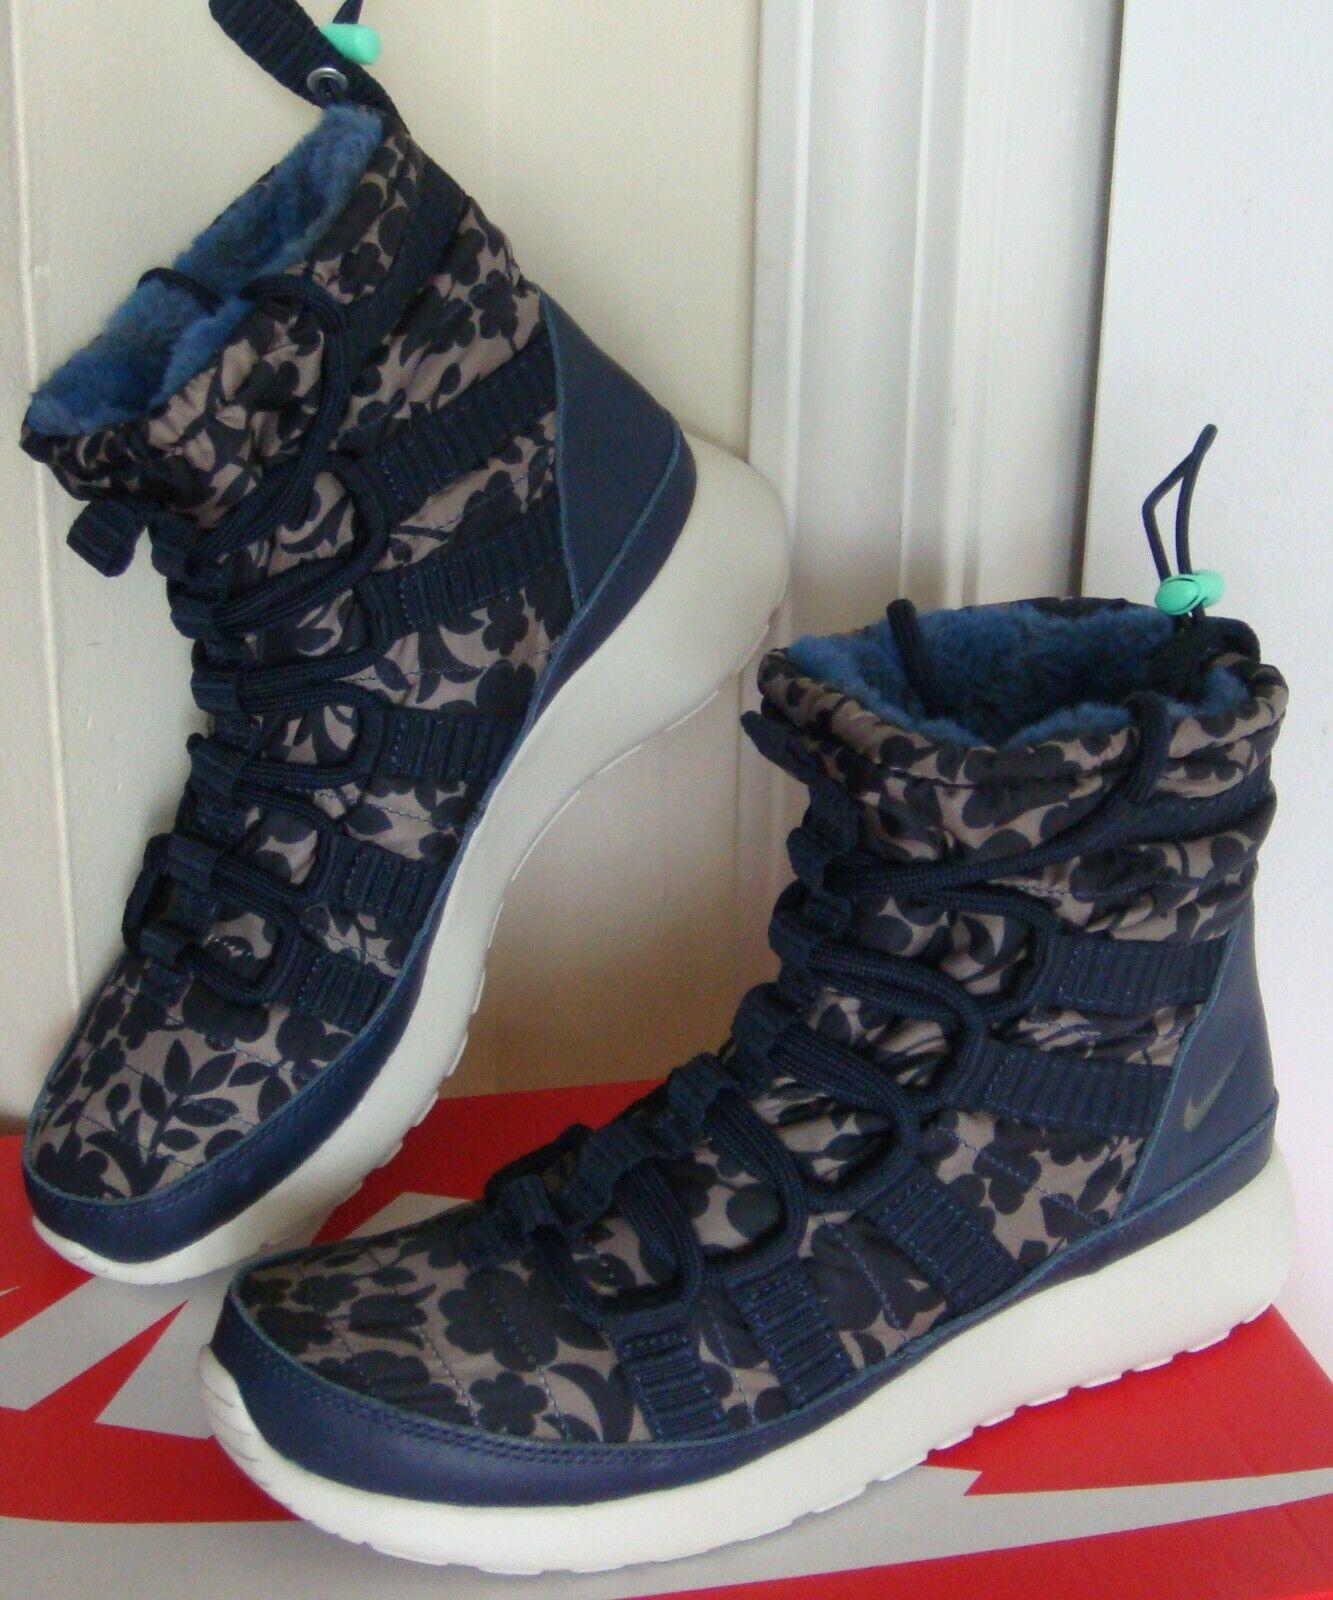 150 Women's Nike Roshe One Hi LIB shoes Boots 821776 400 - Sz. 6